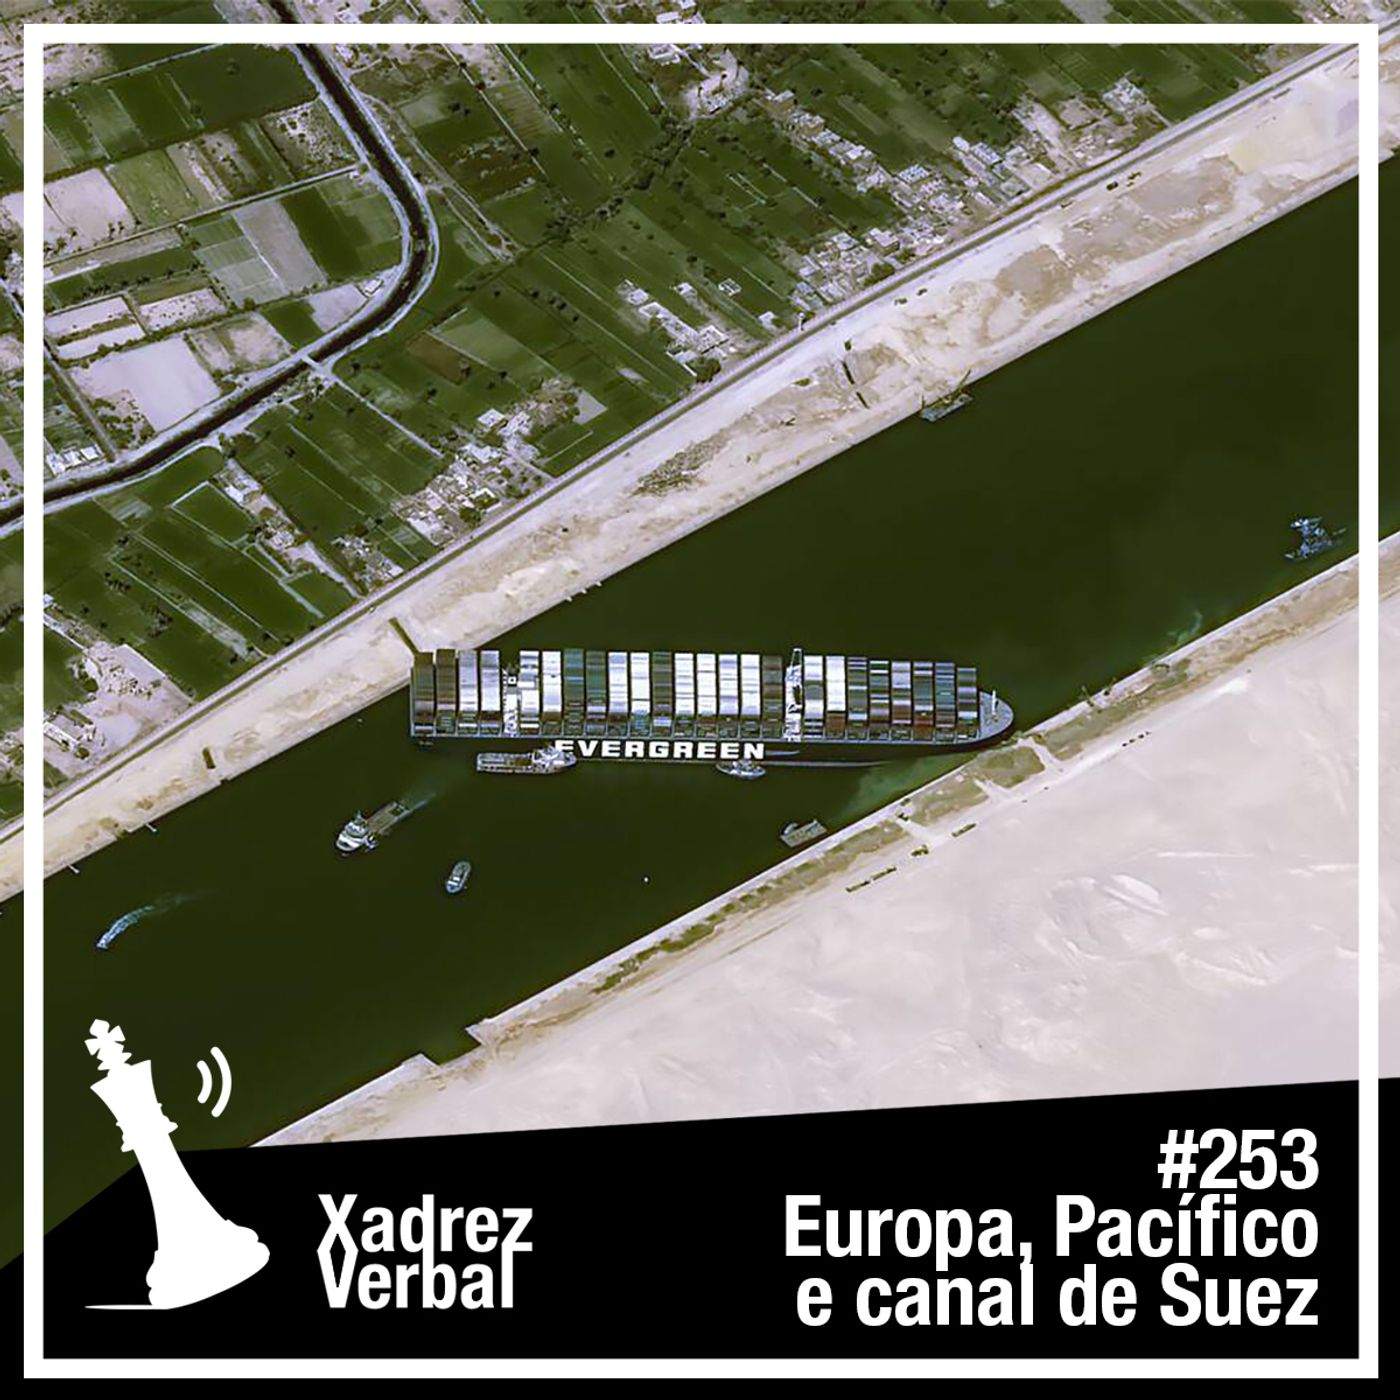 Xadrez Verbal #253 Canal de Suez